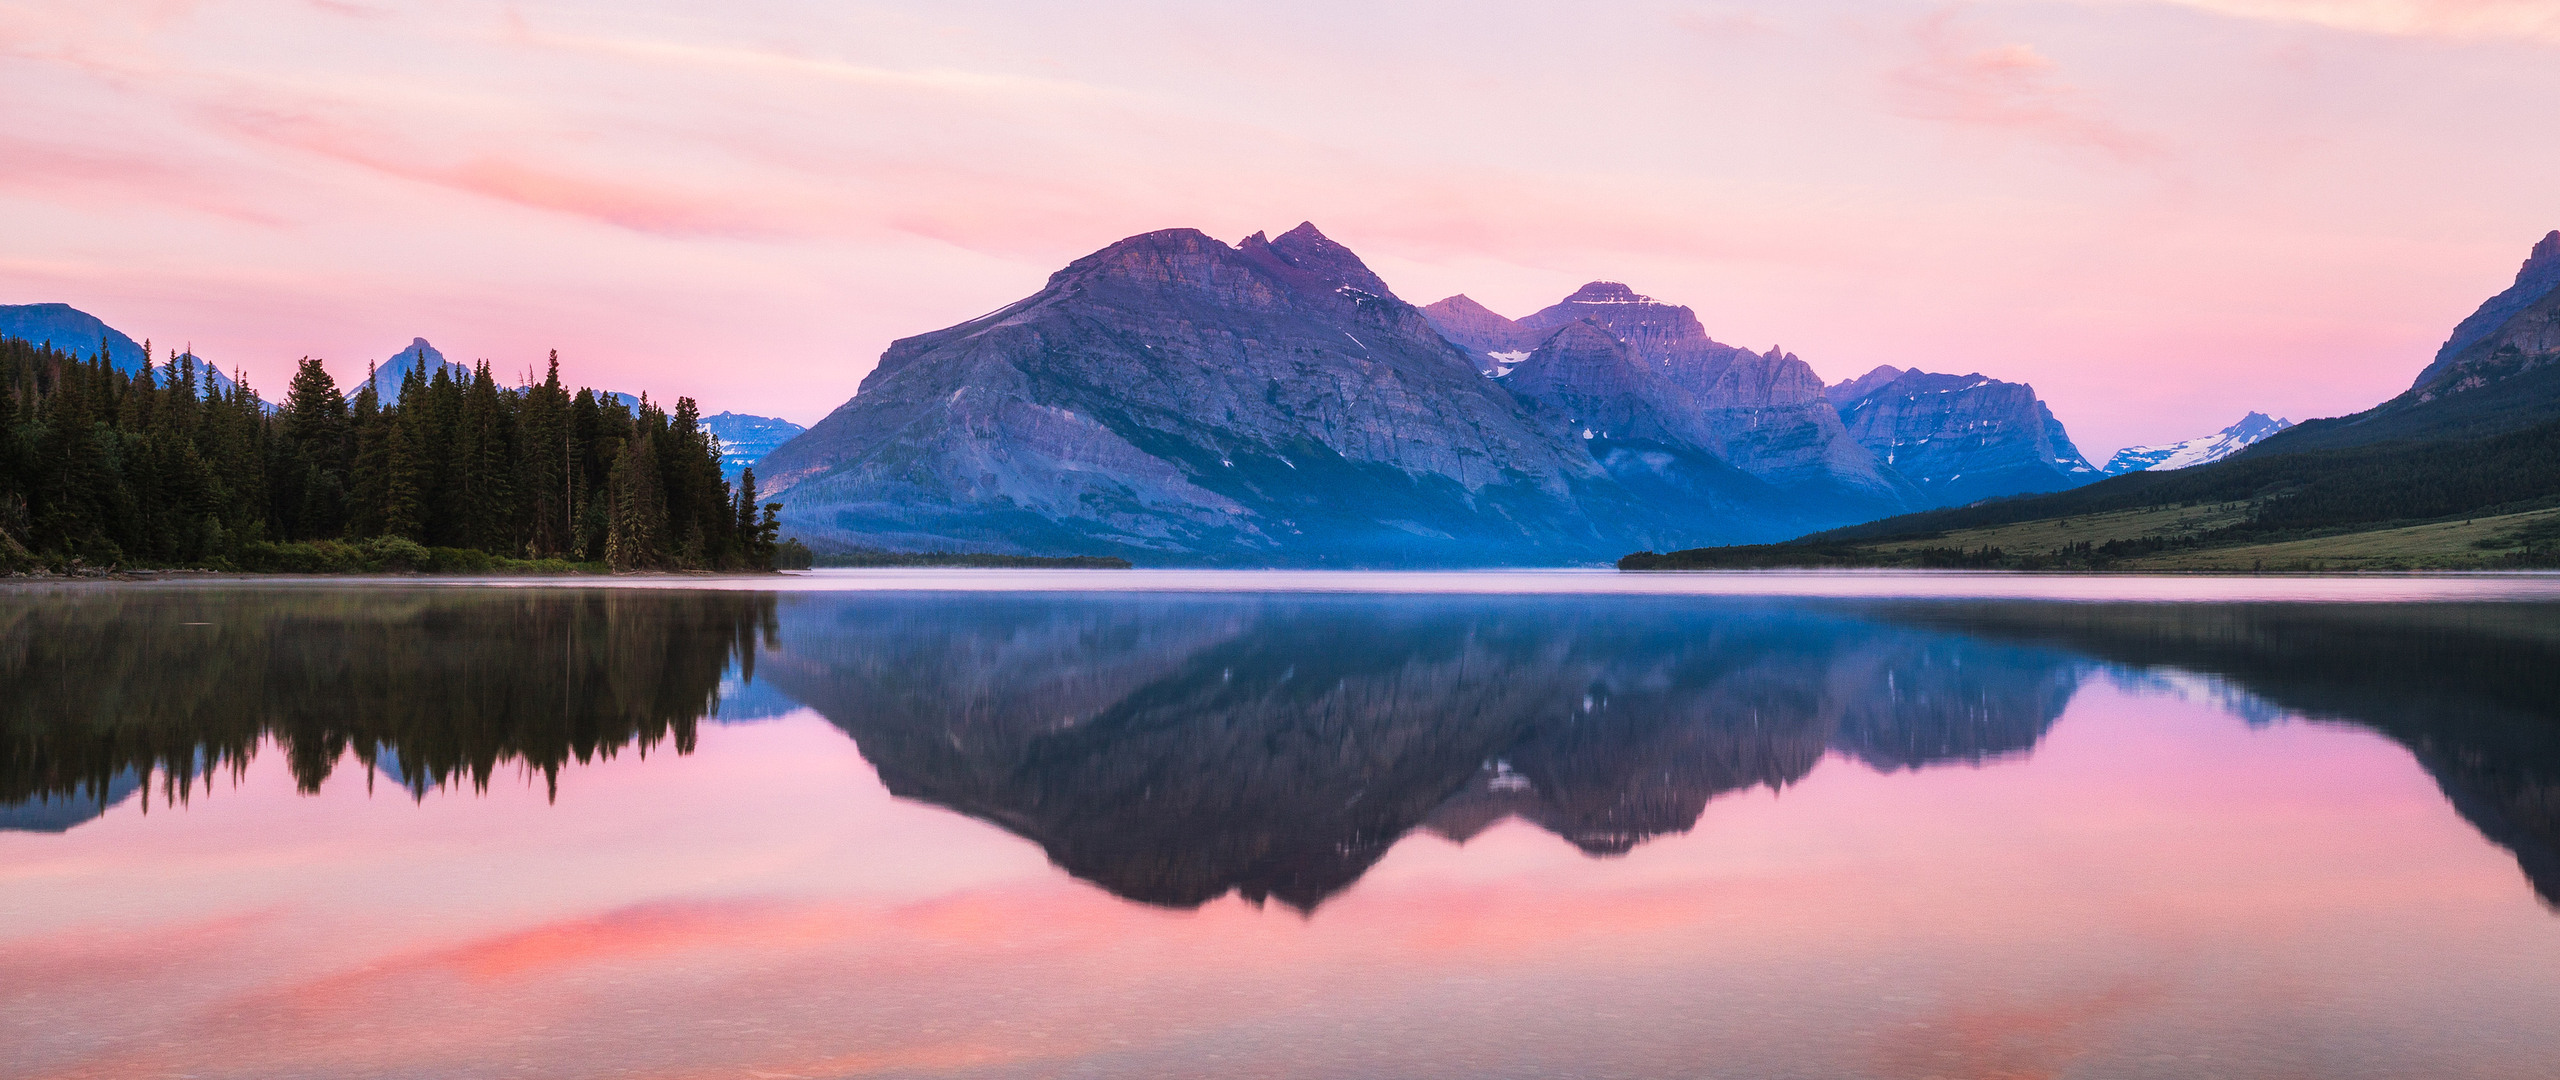 2560x1080 Glacier National Park Sunrise 2560x1080 Resolution Hd 4k